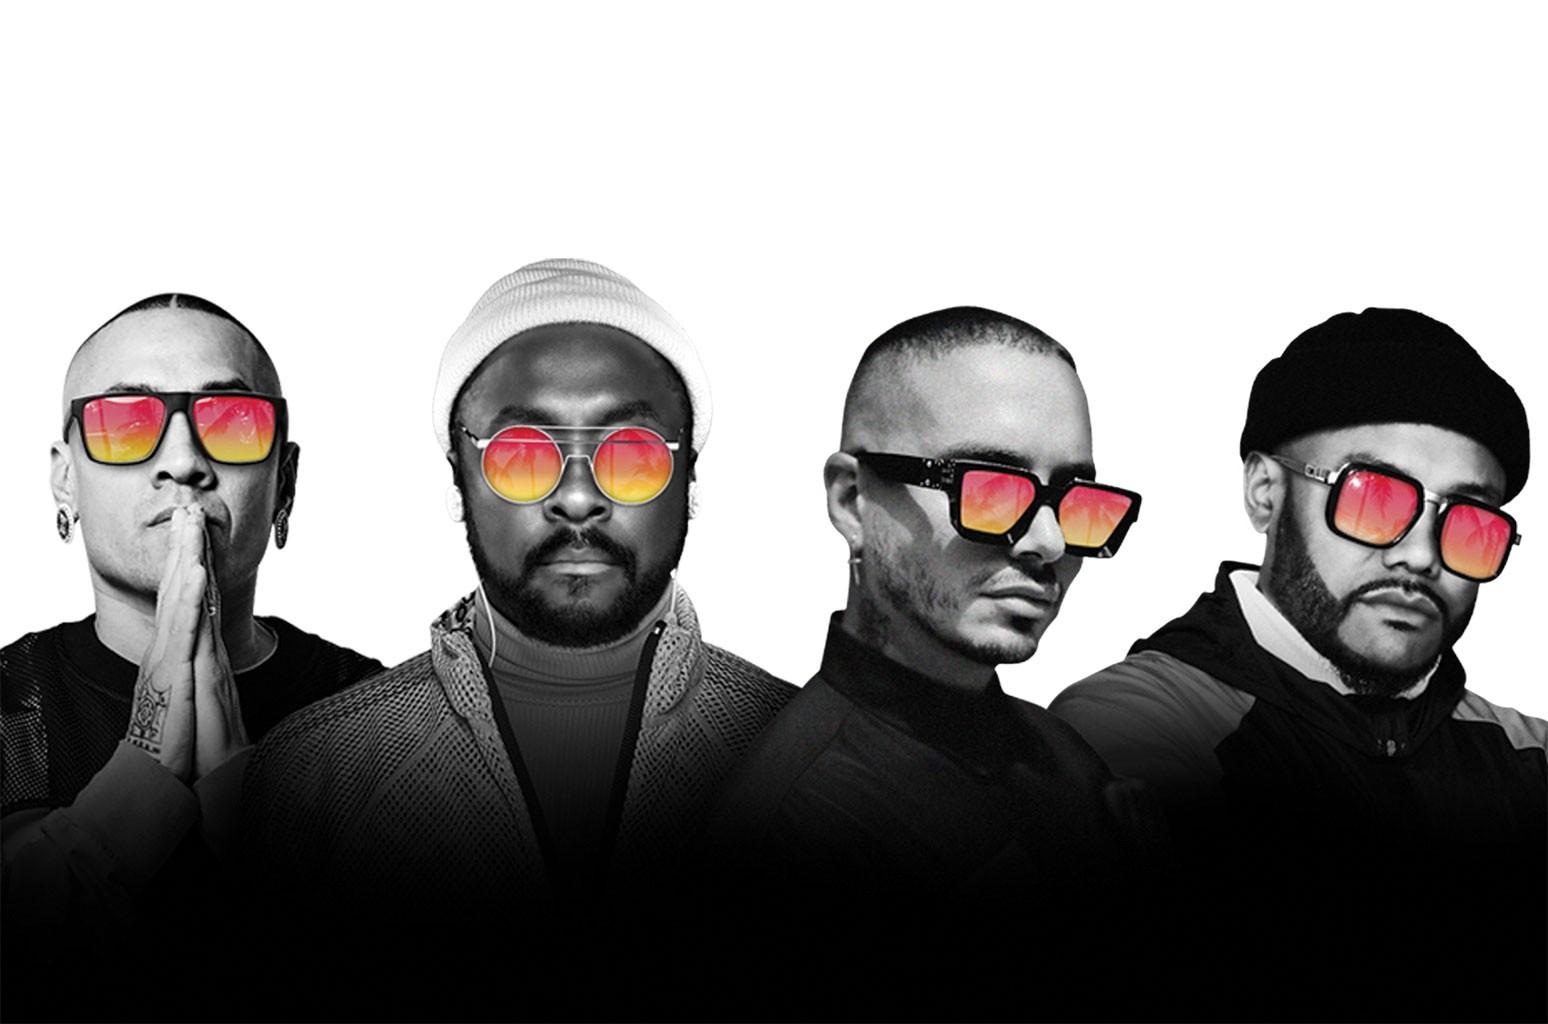 Black Eyed Peas and J Balvin